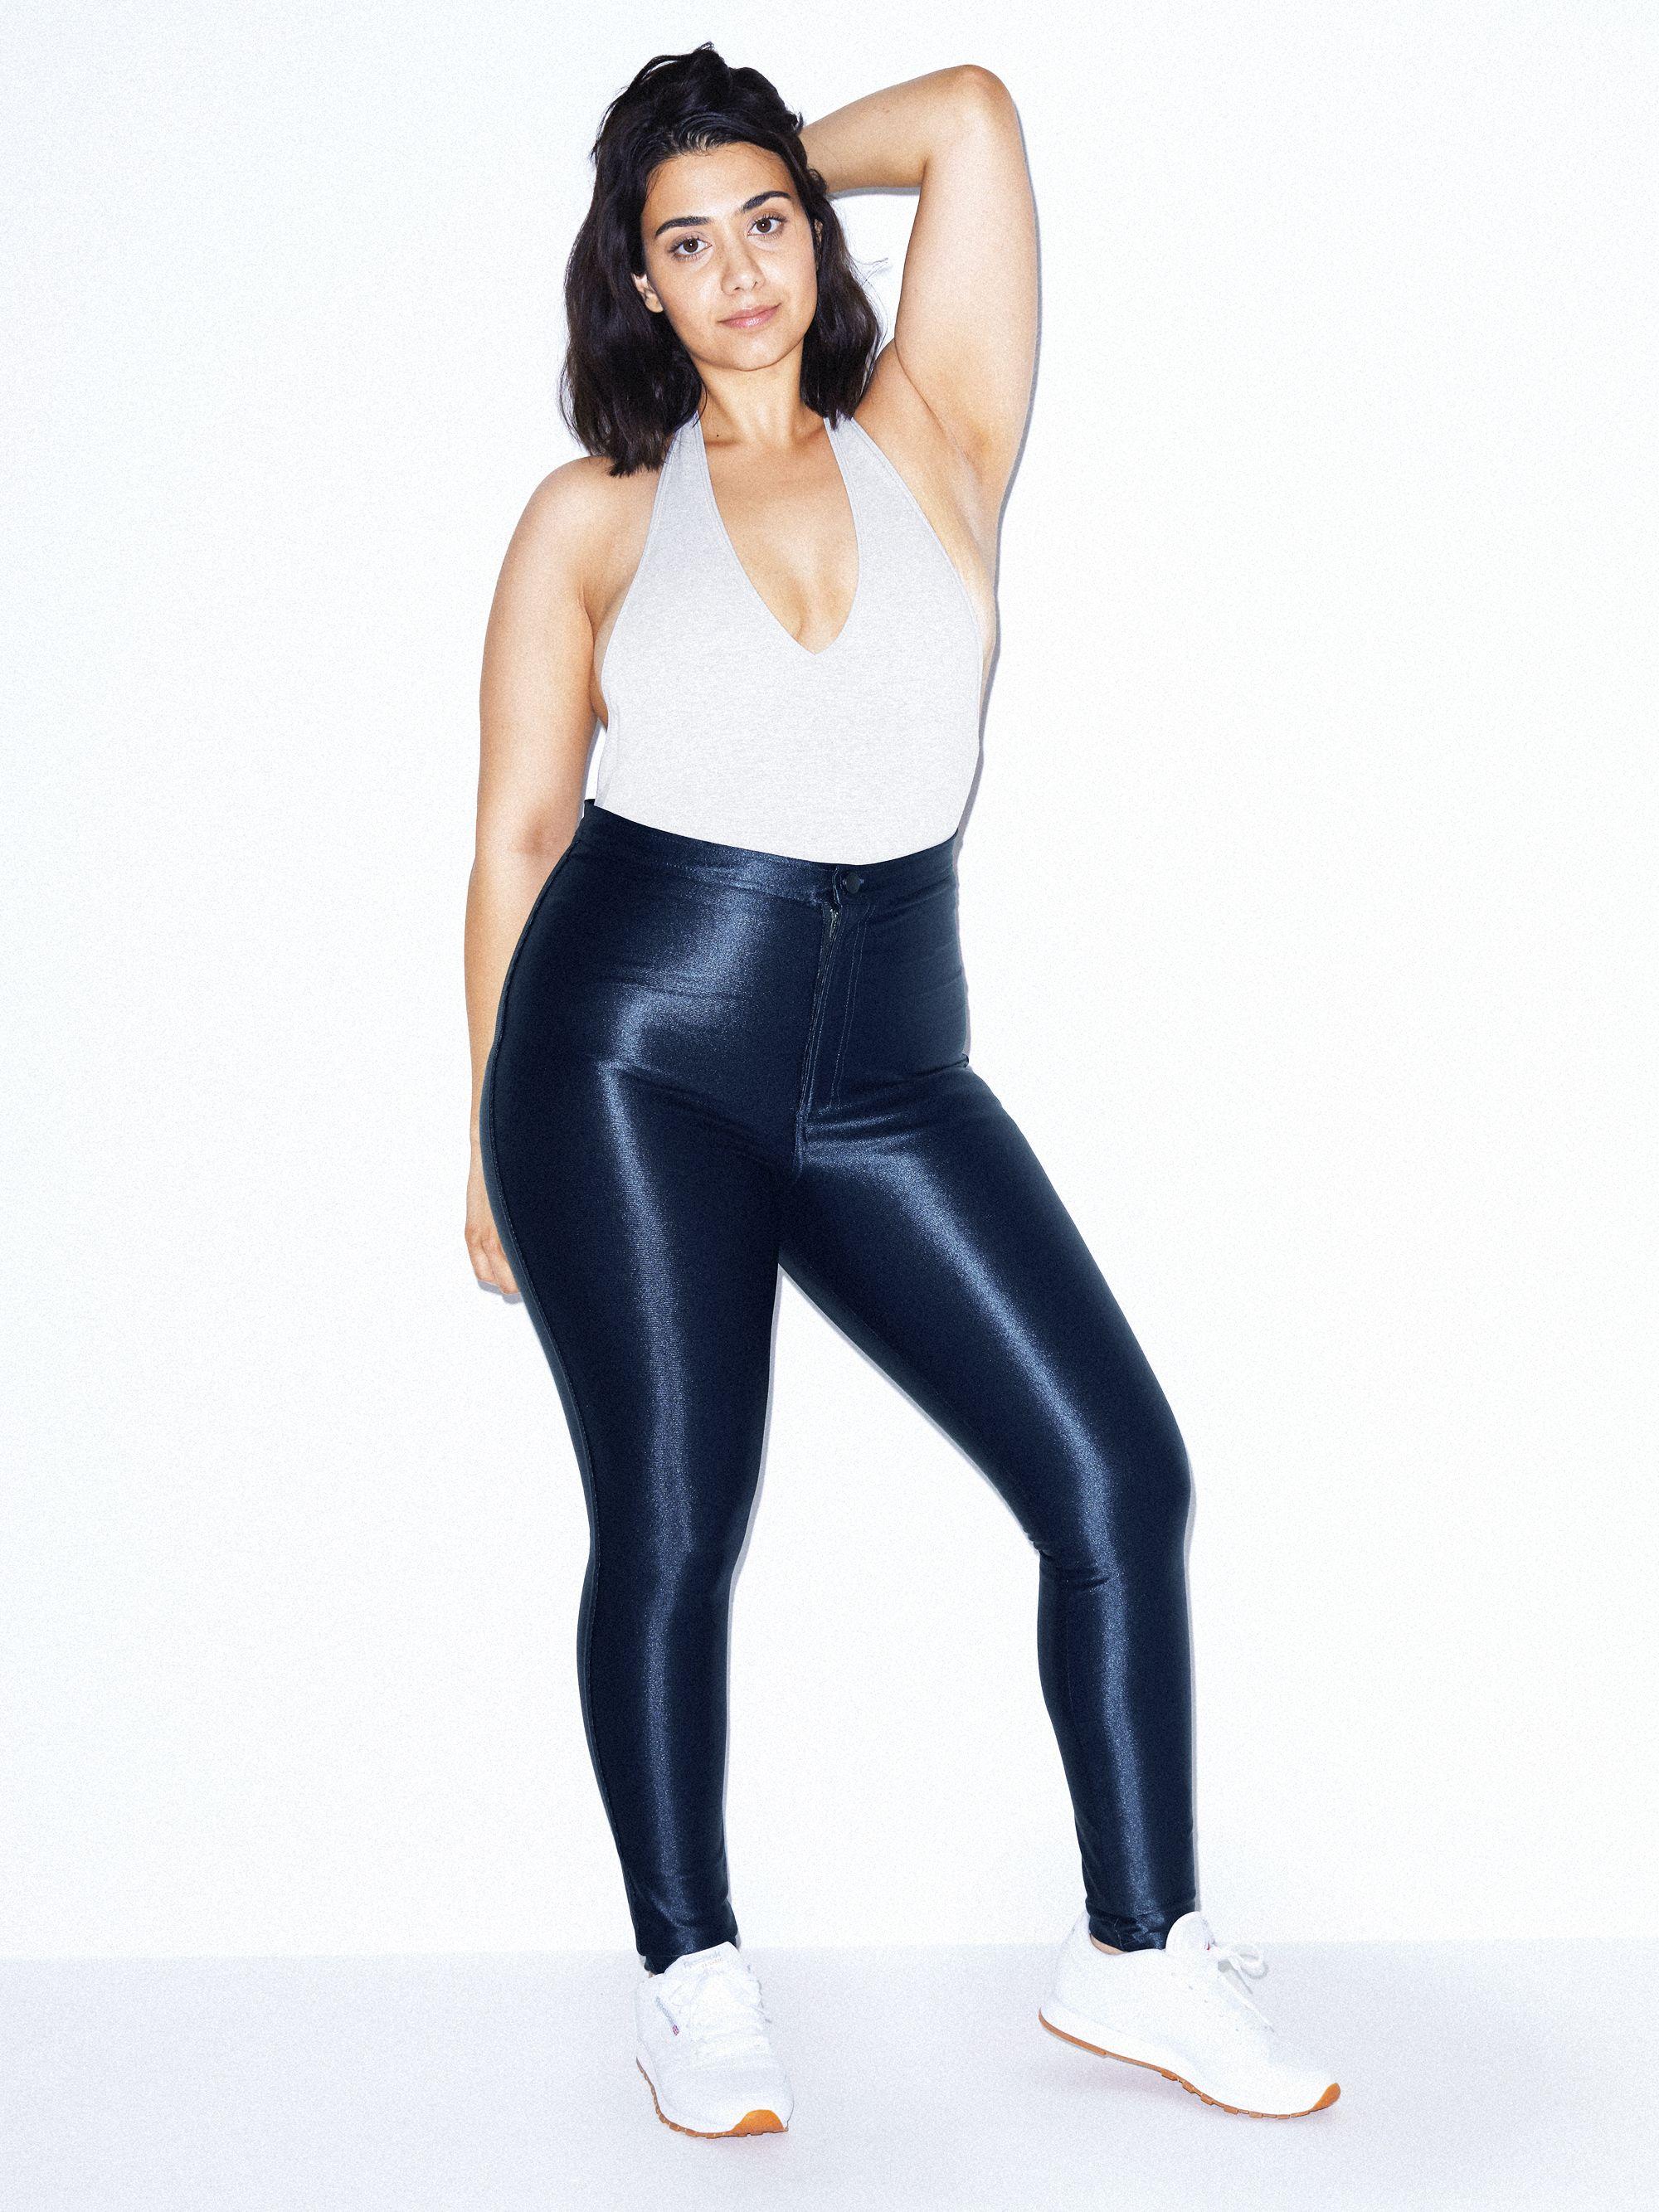 Homegrown porn tube sexy nylons pics